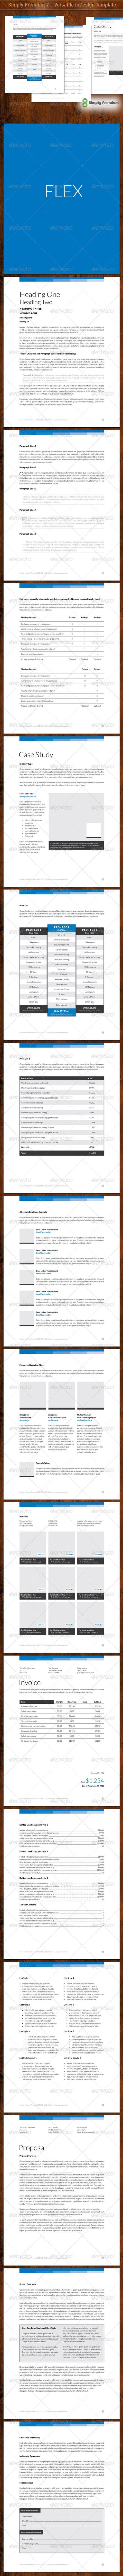 87 best Print Templates images on Pinterest   Print templates, Font ...